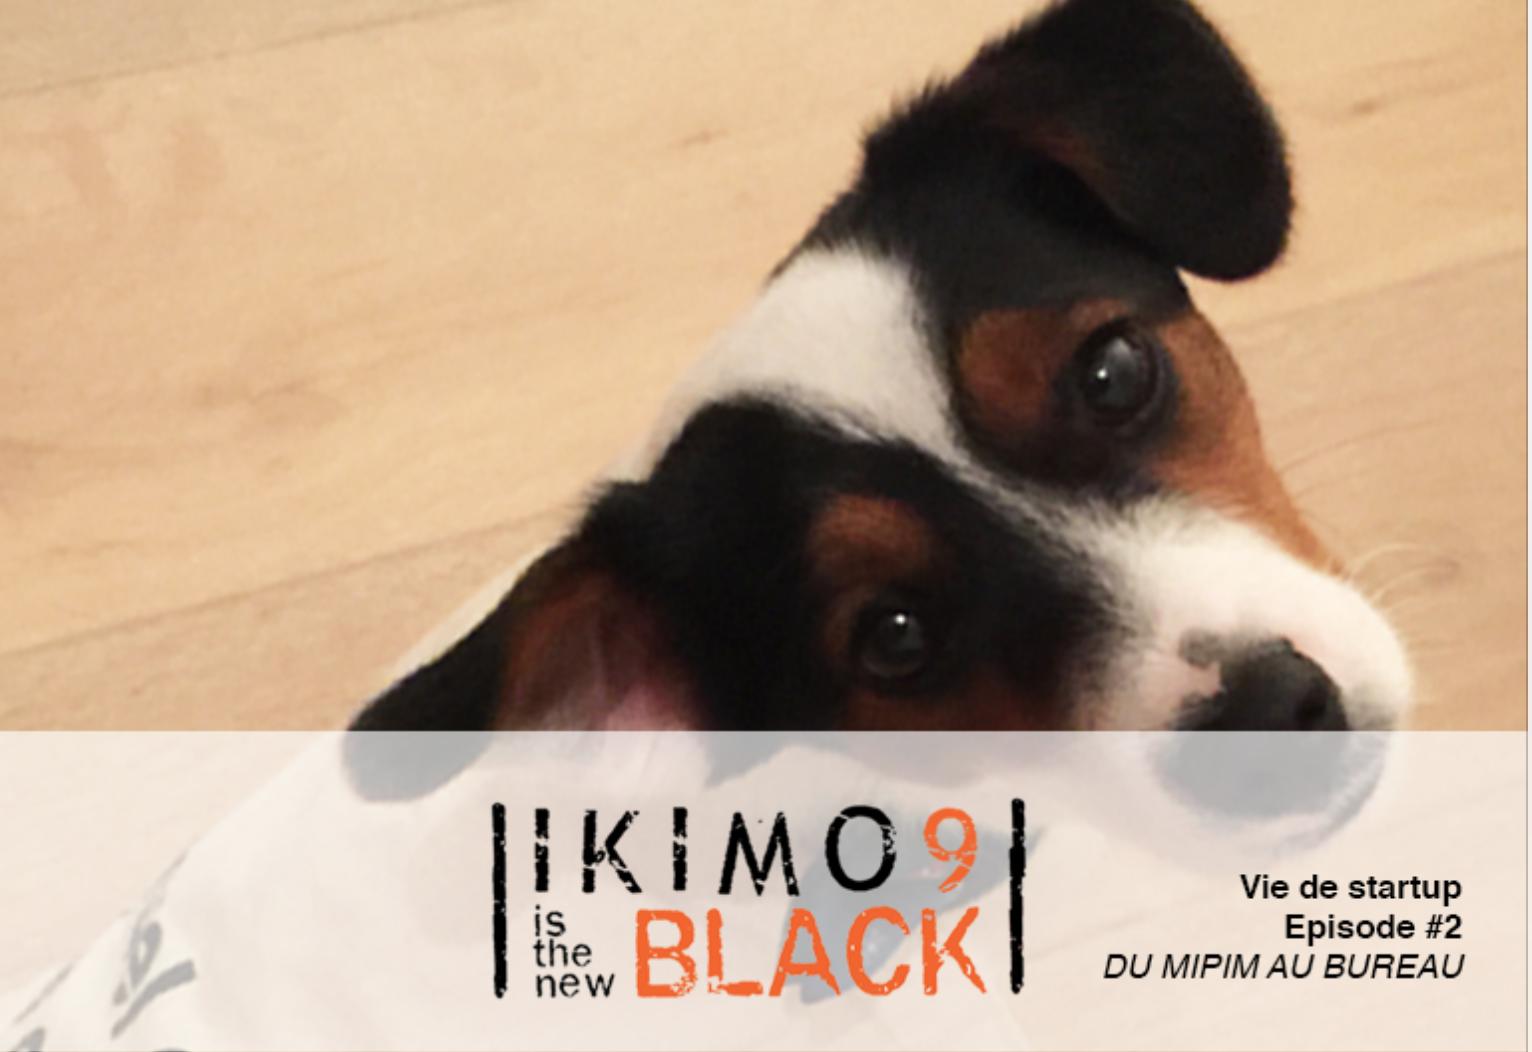 ikimo9-is-the-new-black-vie-de-start-up-episode-2